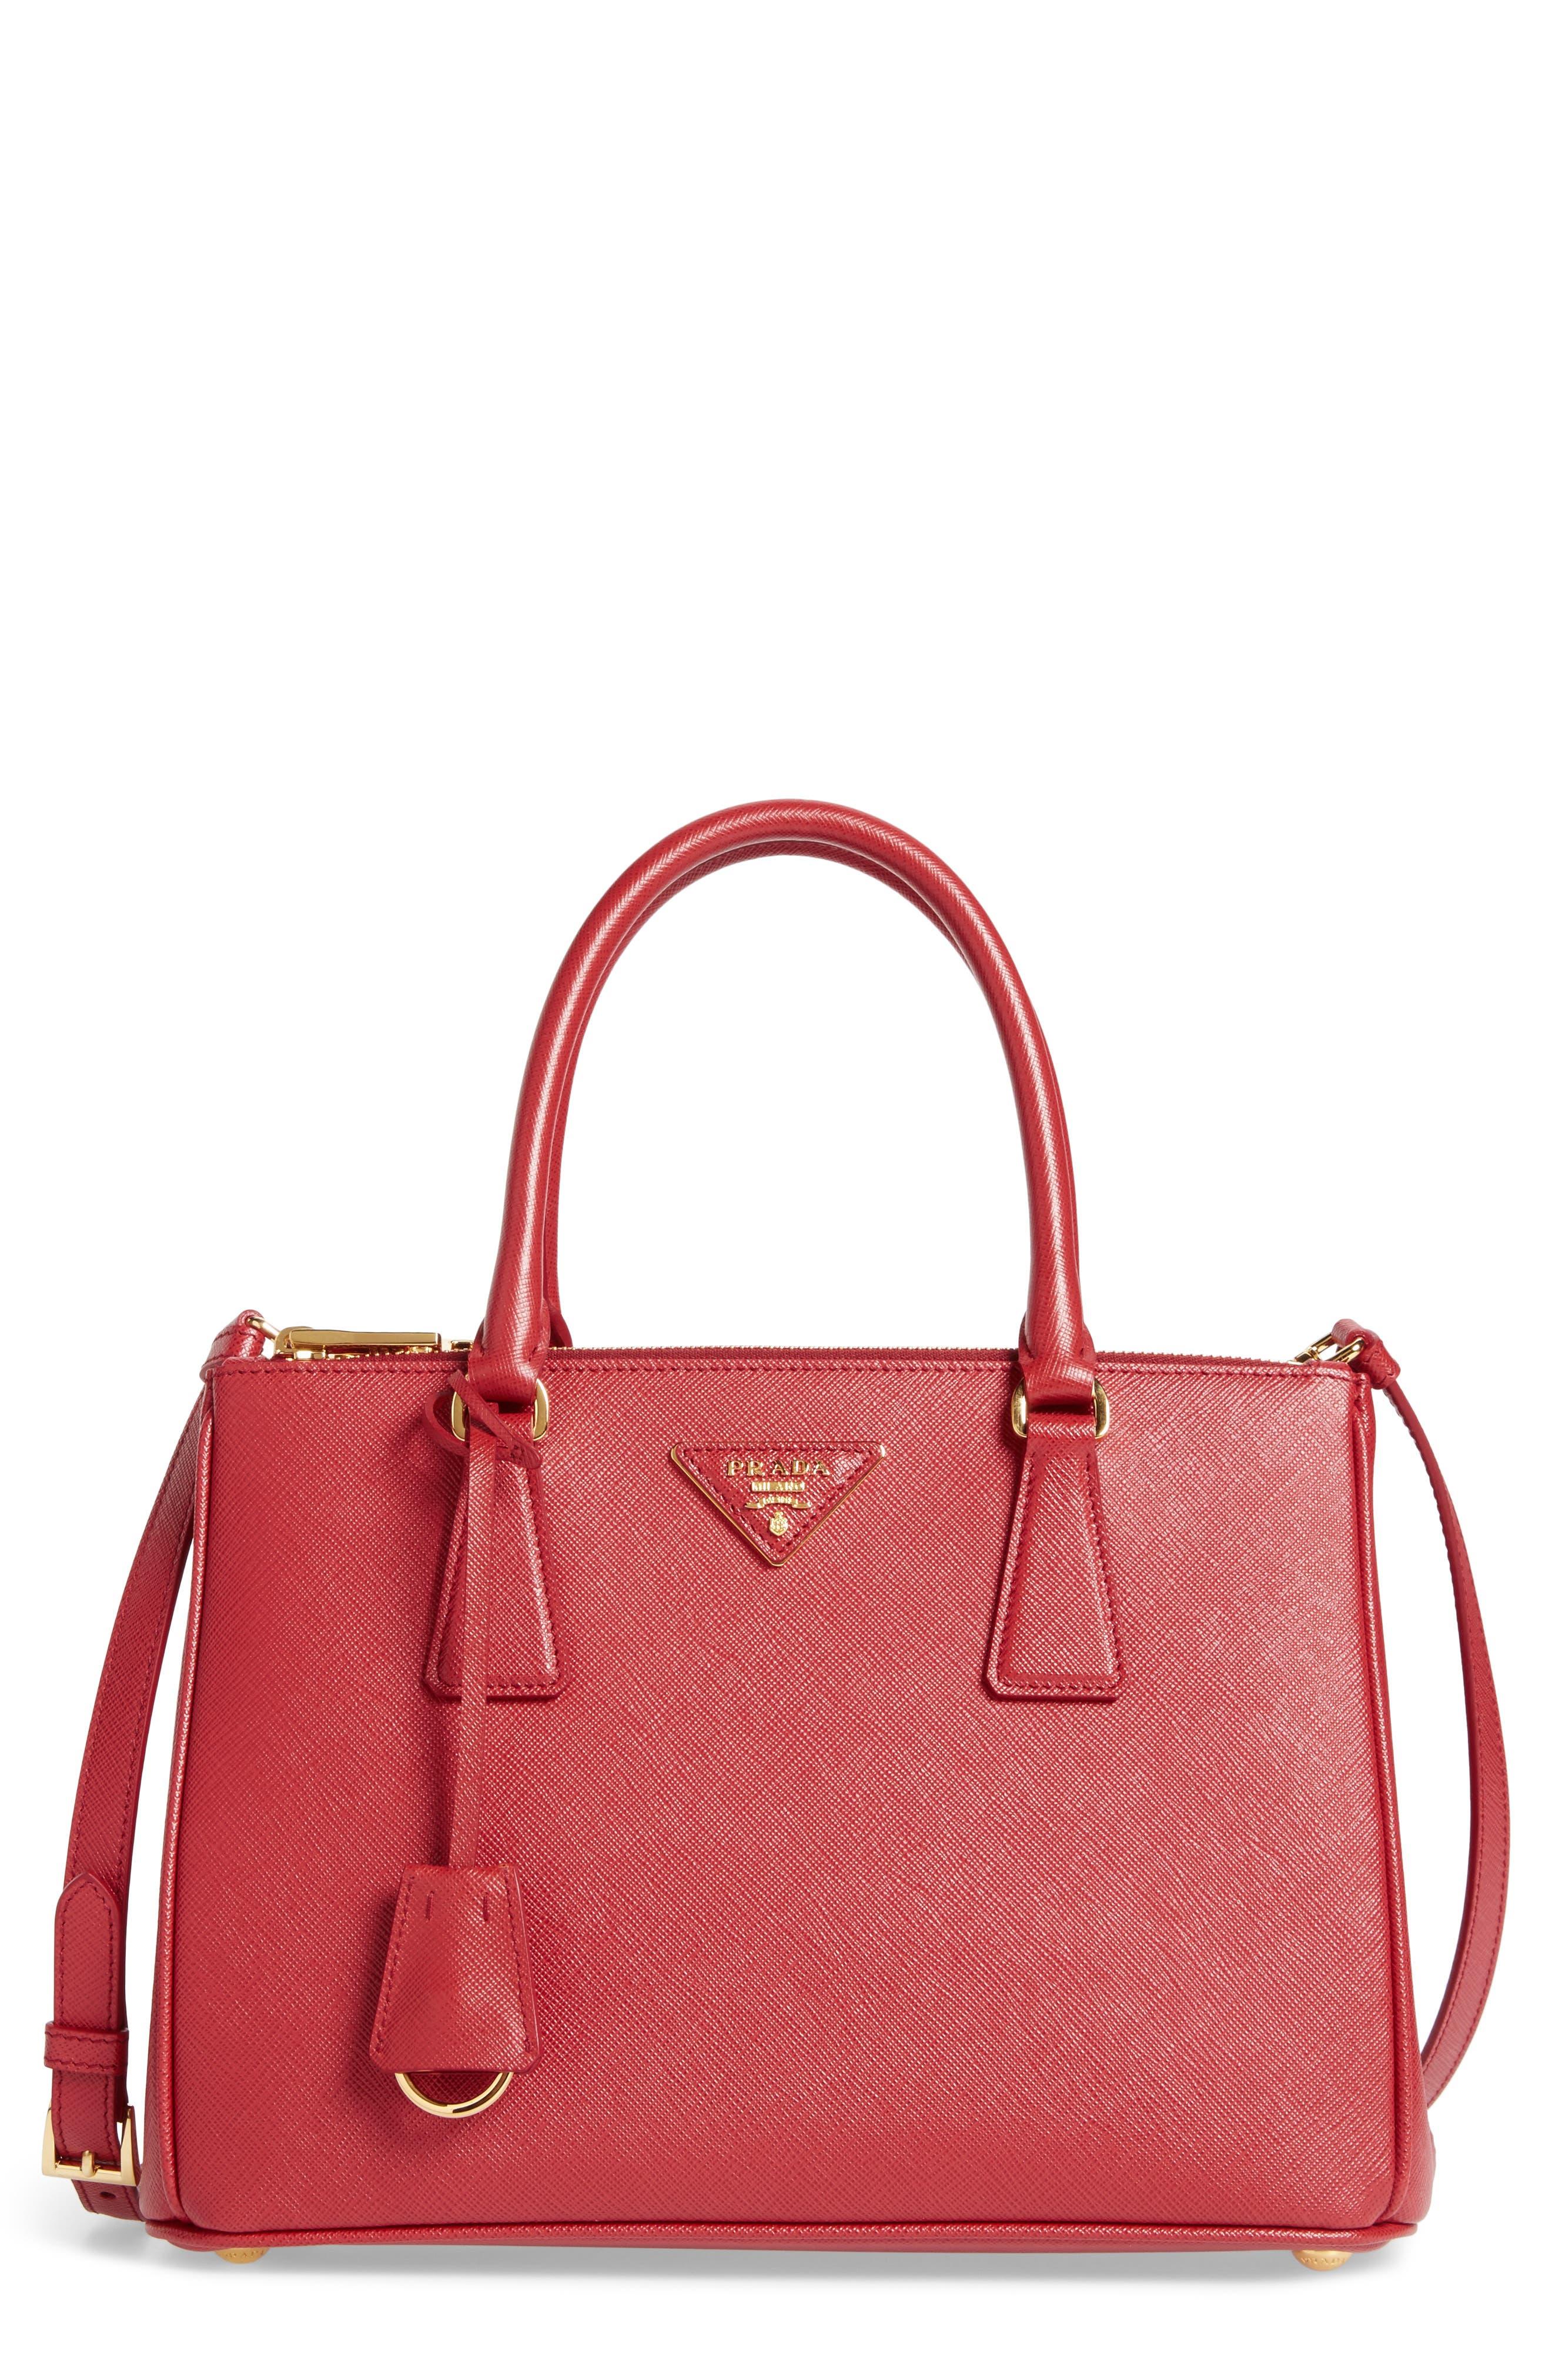 Prada Saffiano Lux Leather Satchel